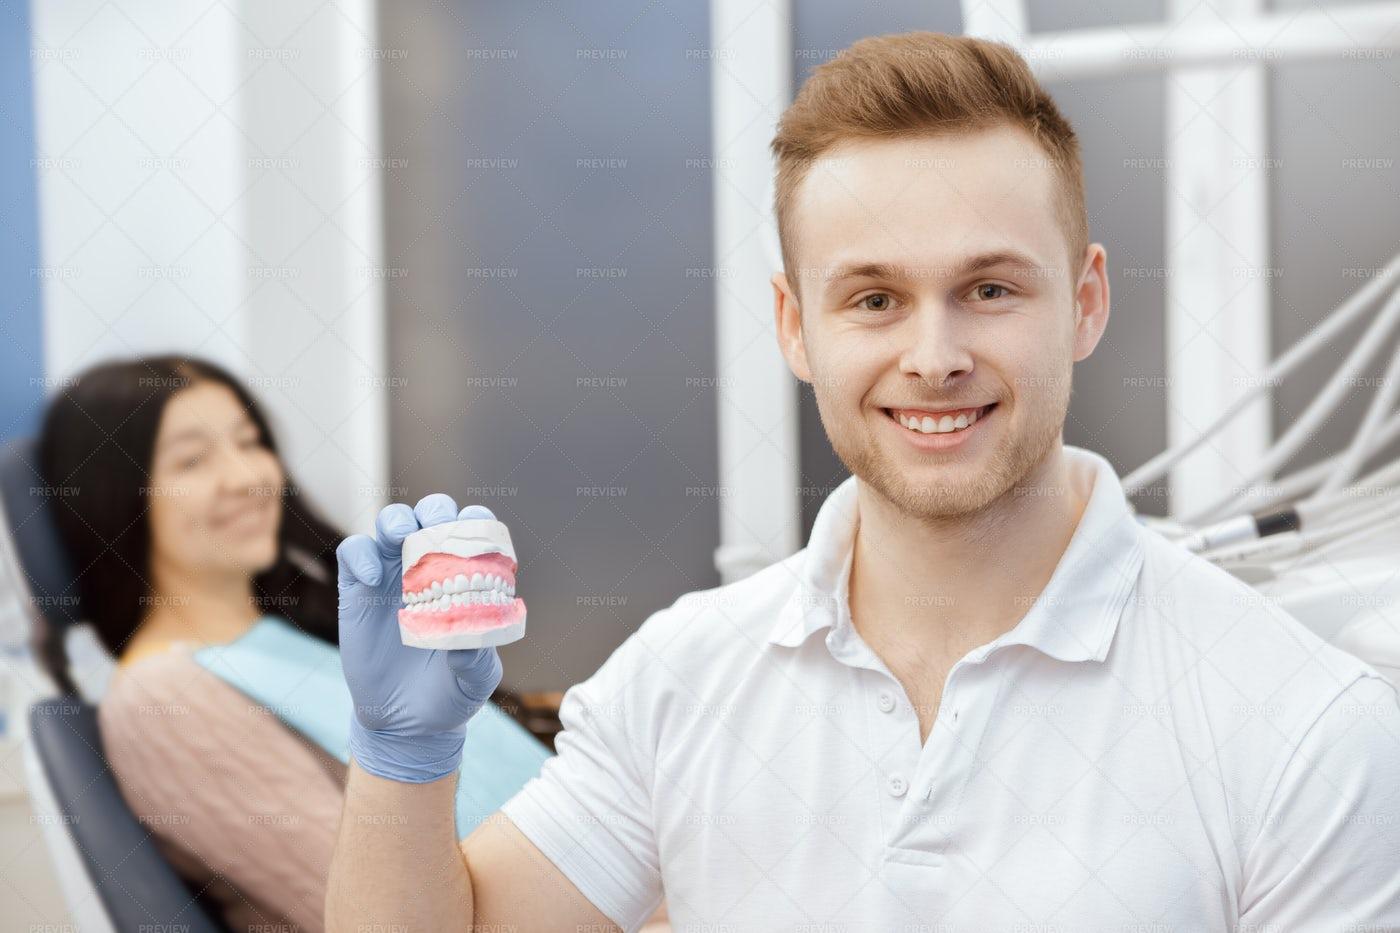 Dentist Shows Mold: Stock Photos